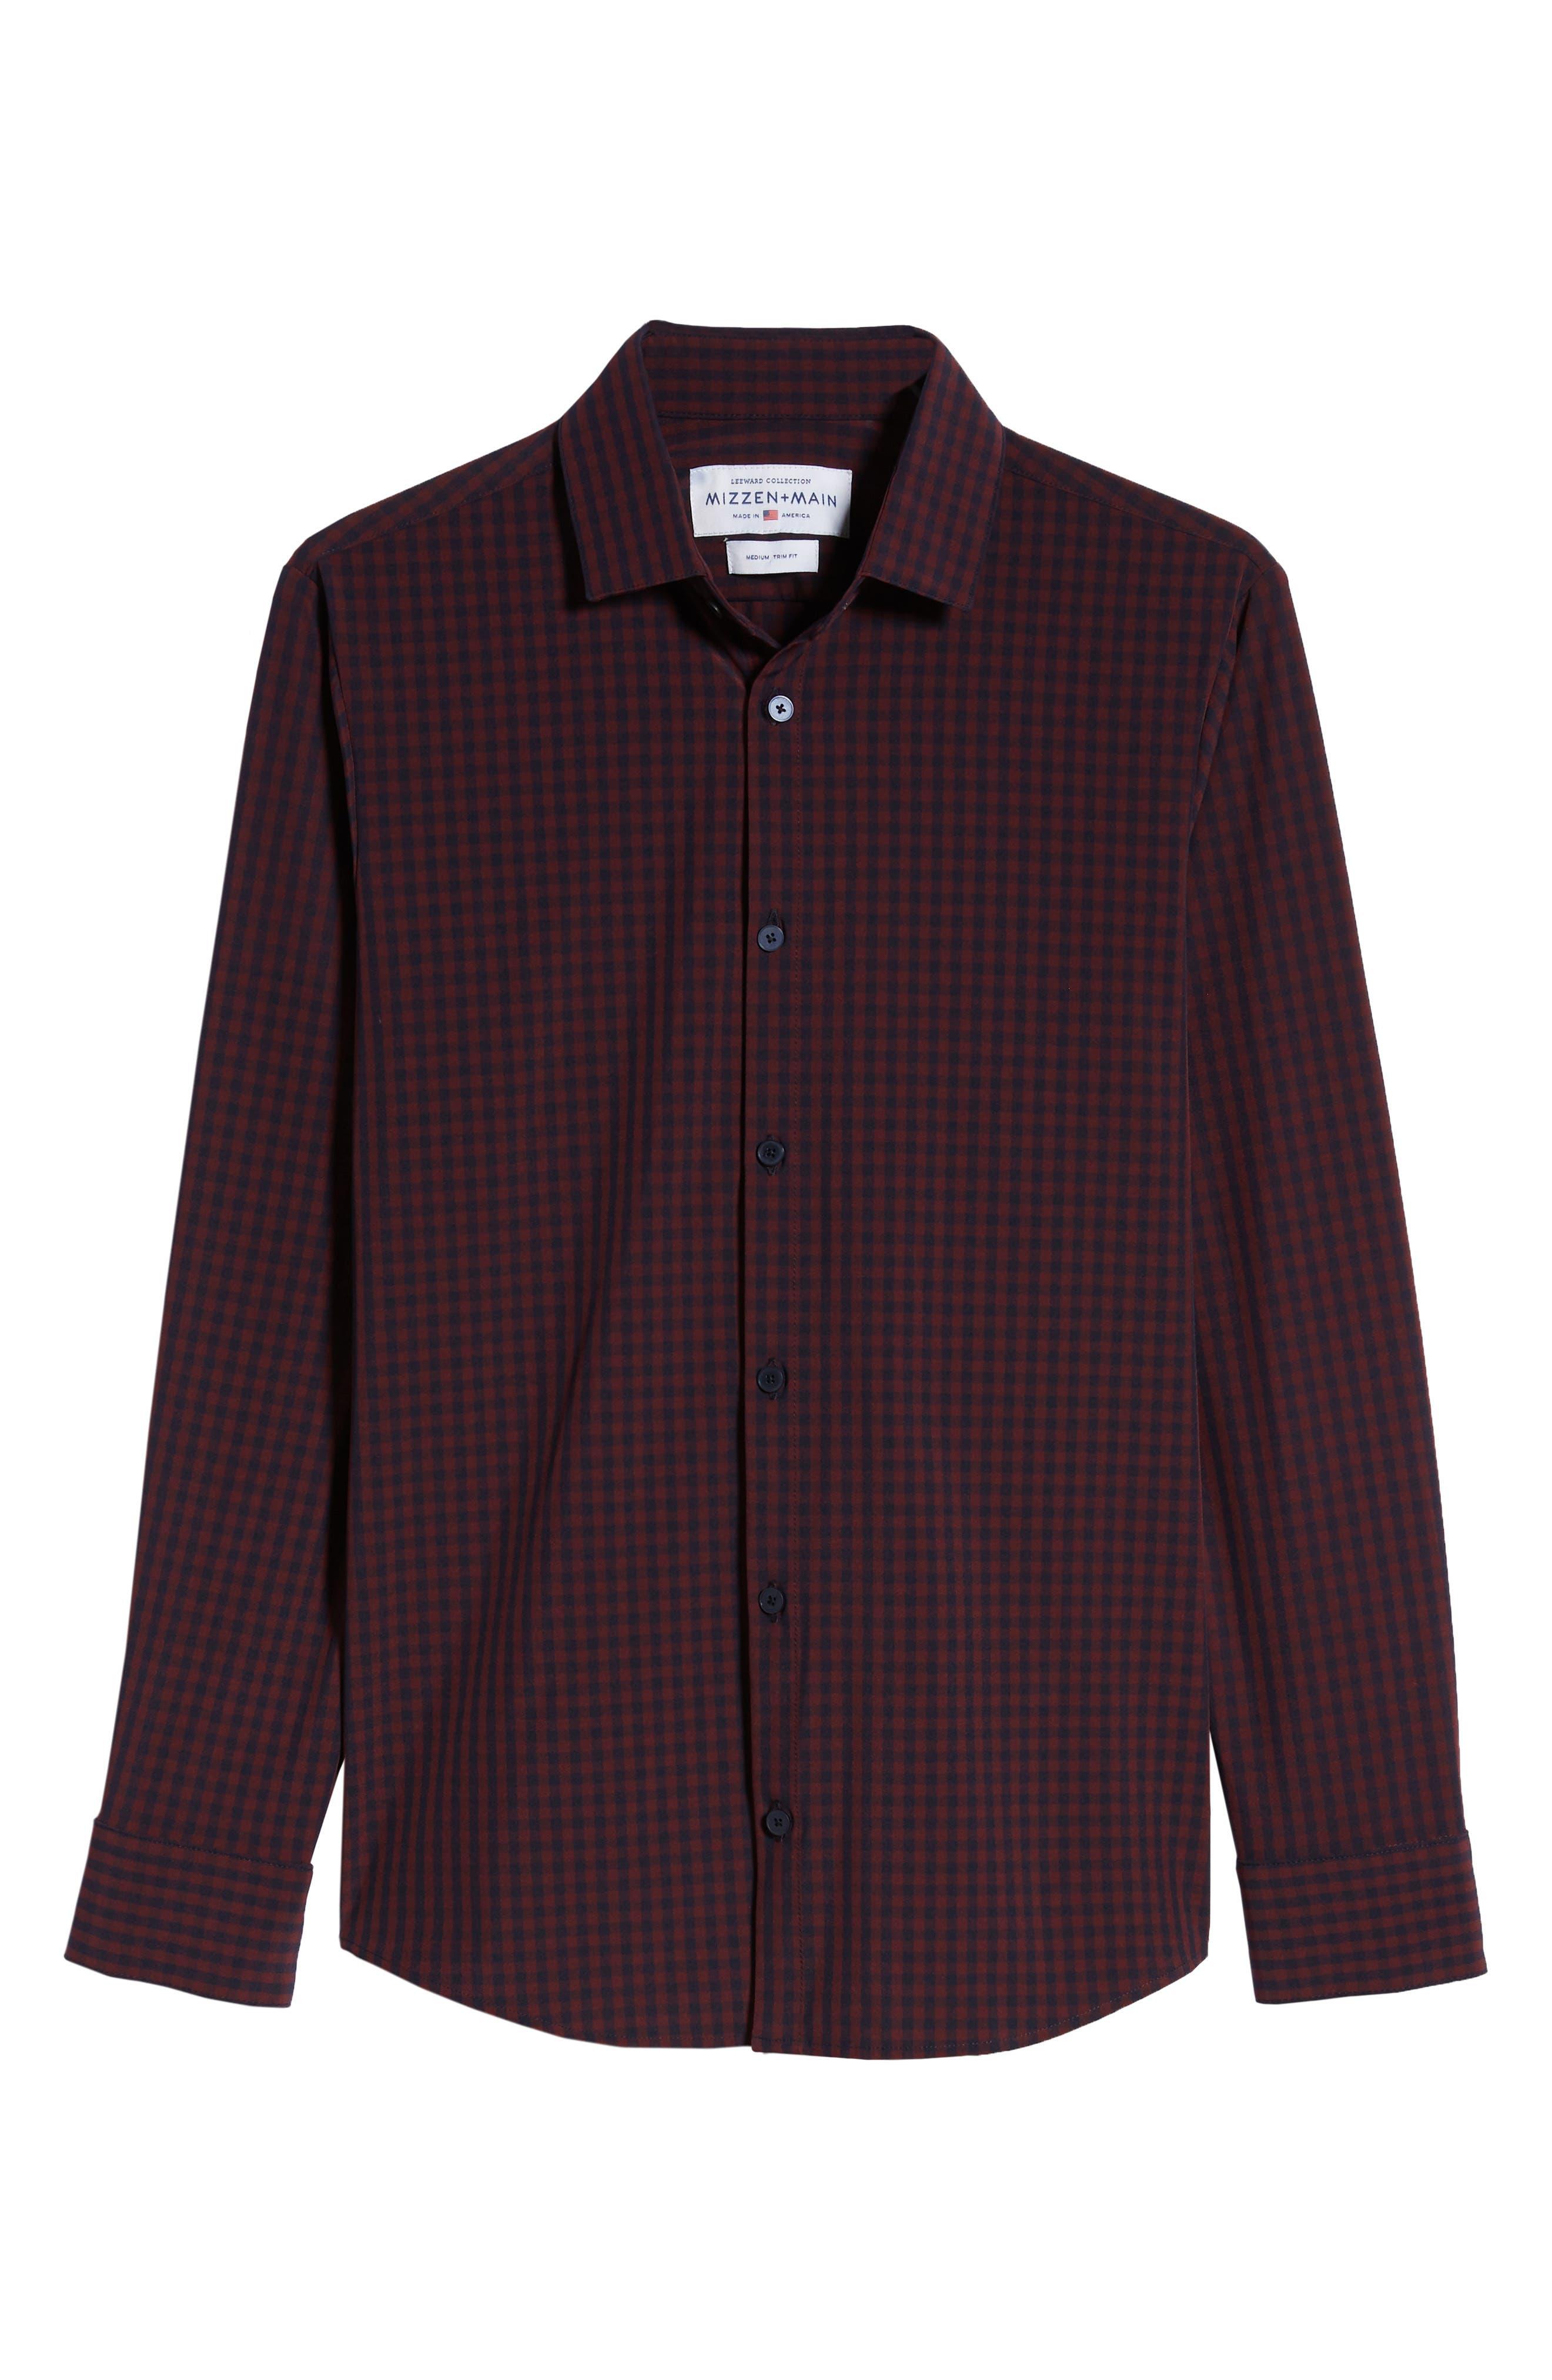 MIZZEN+MAIN, Marshall Check Sport Shirt, Alternate thumbnail 5, color, 930